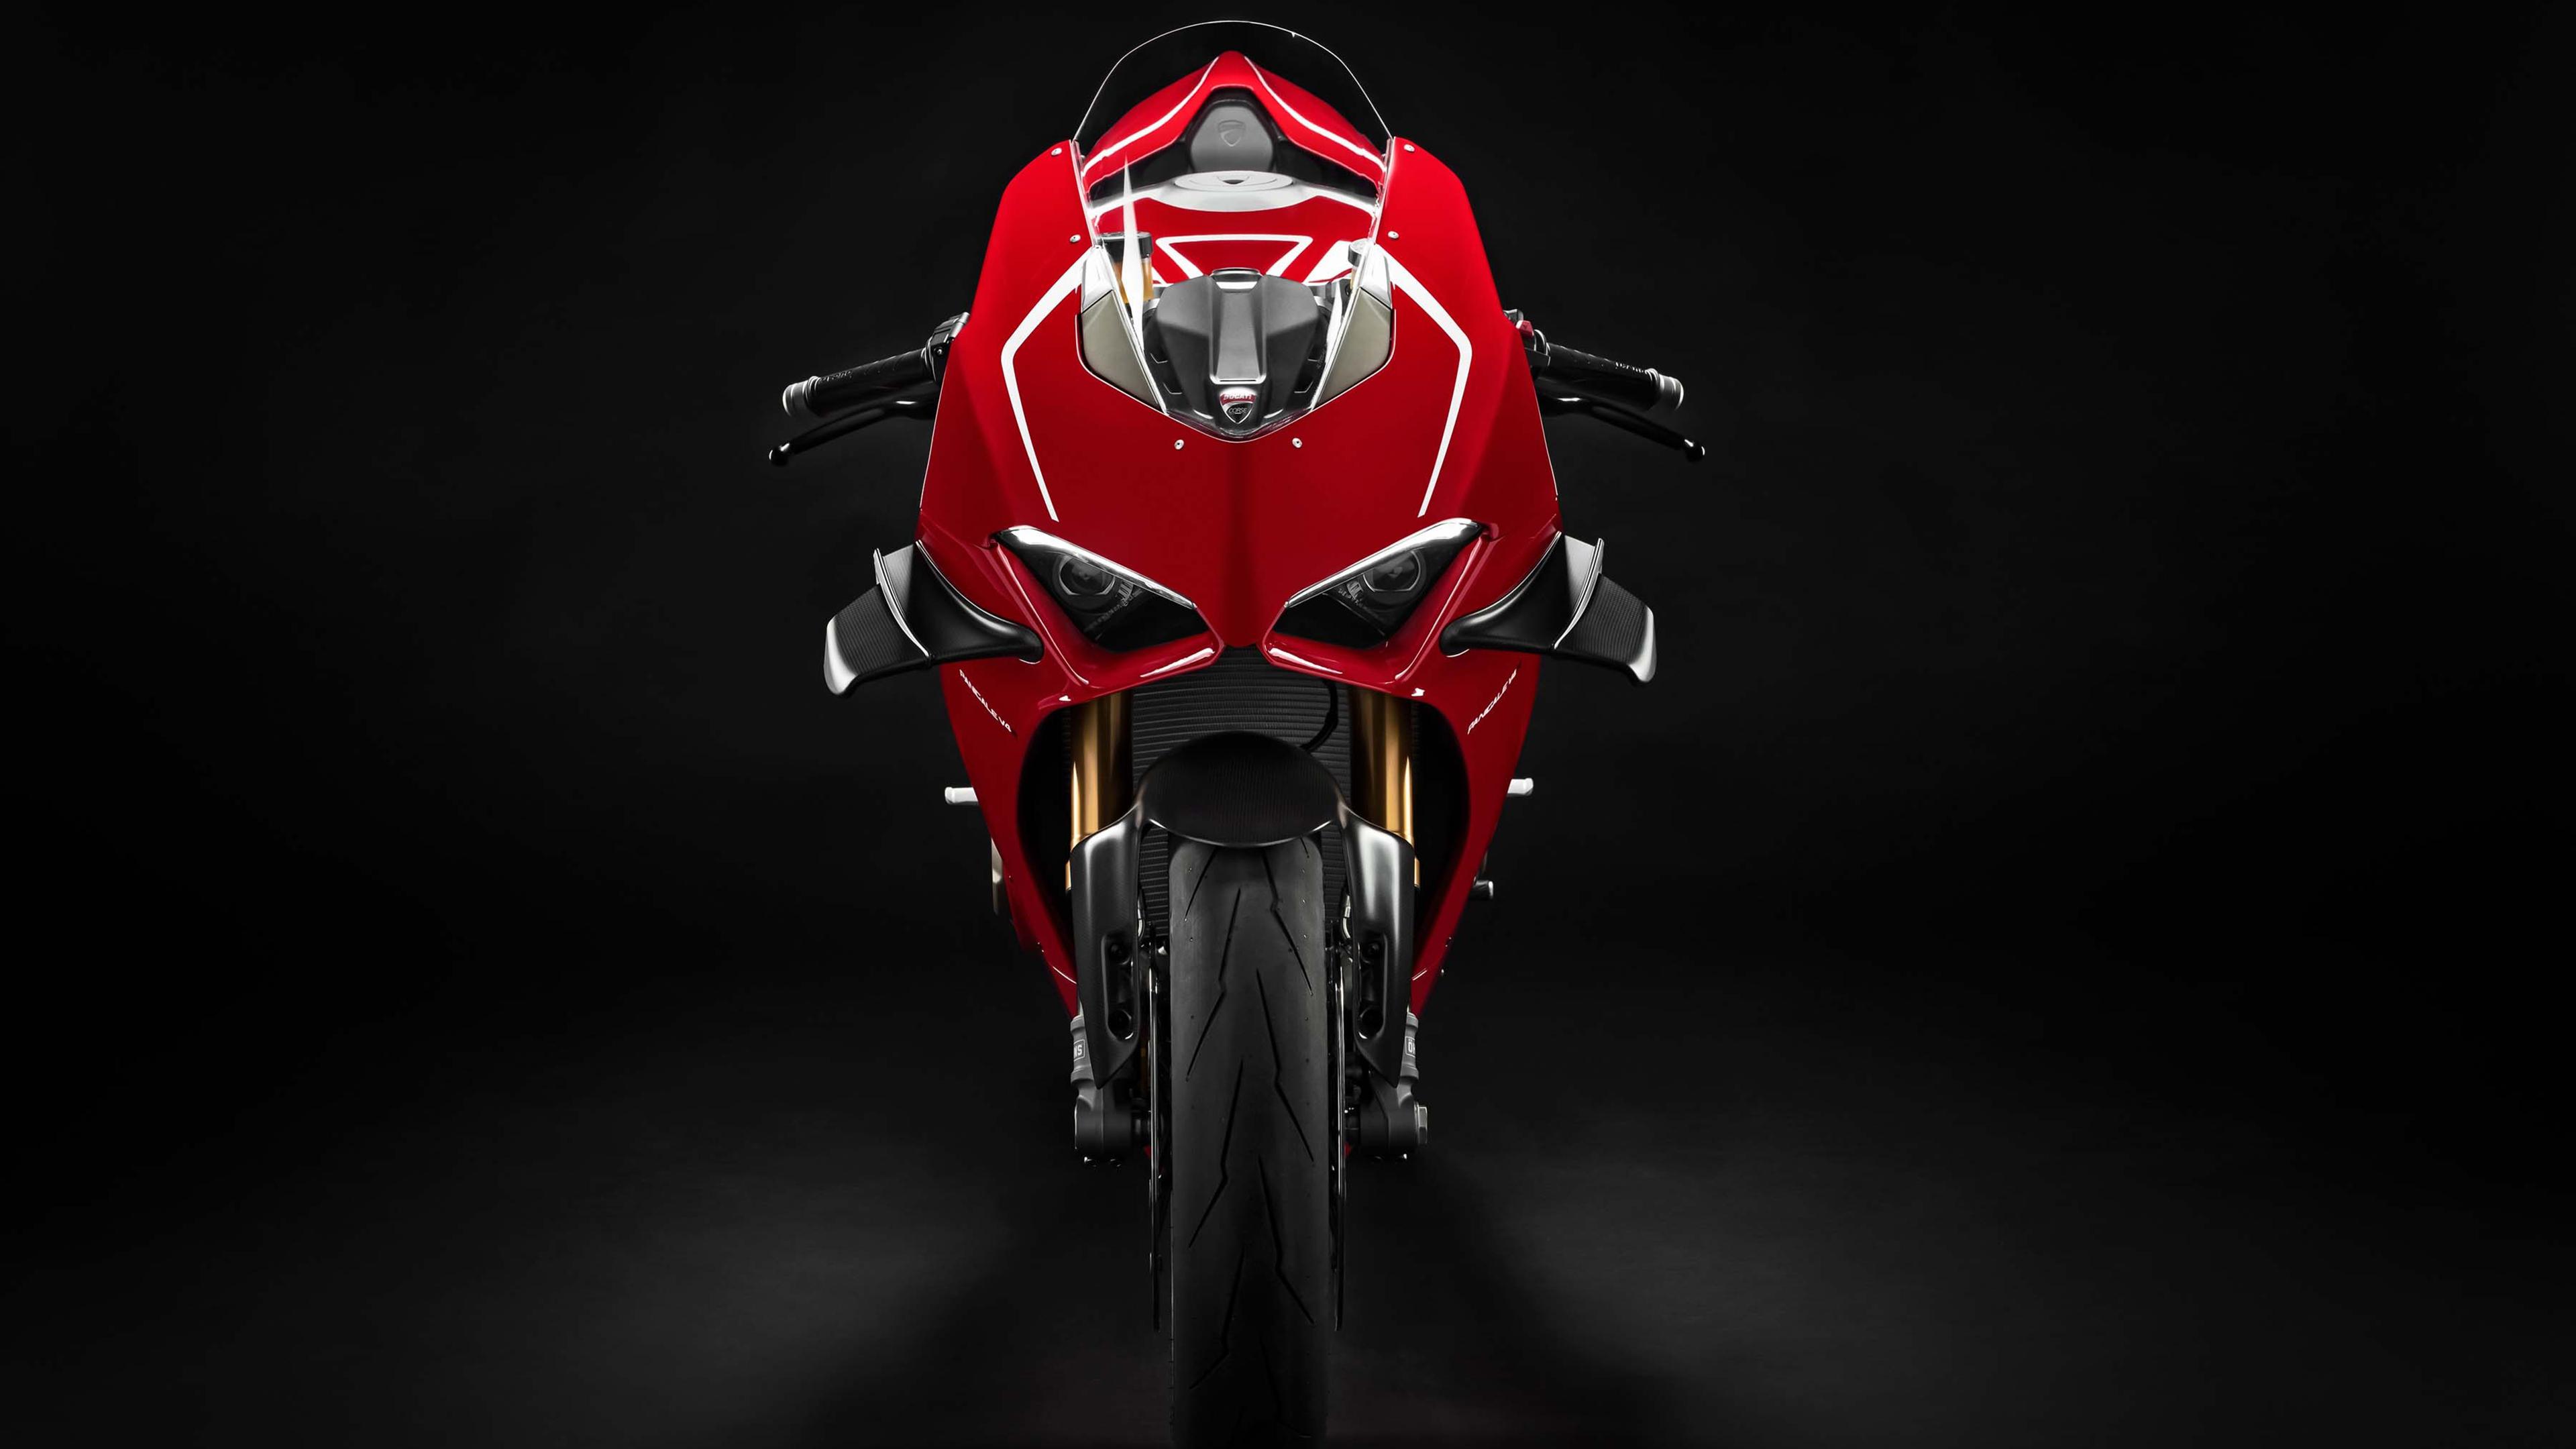 Ducati panigale r 2019 обои скачать